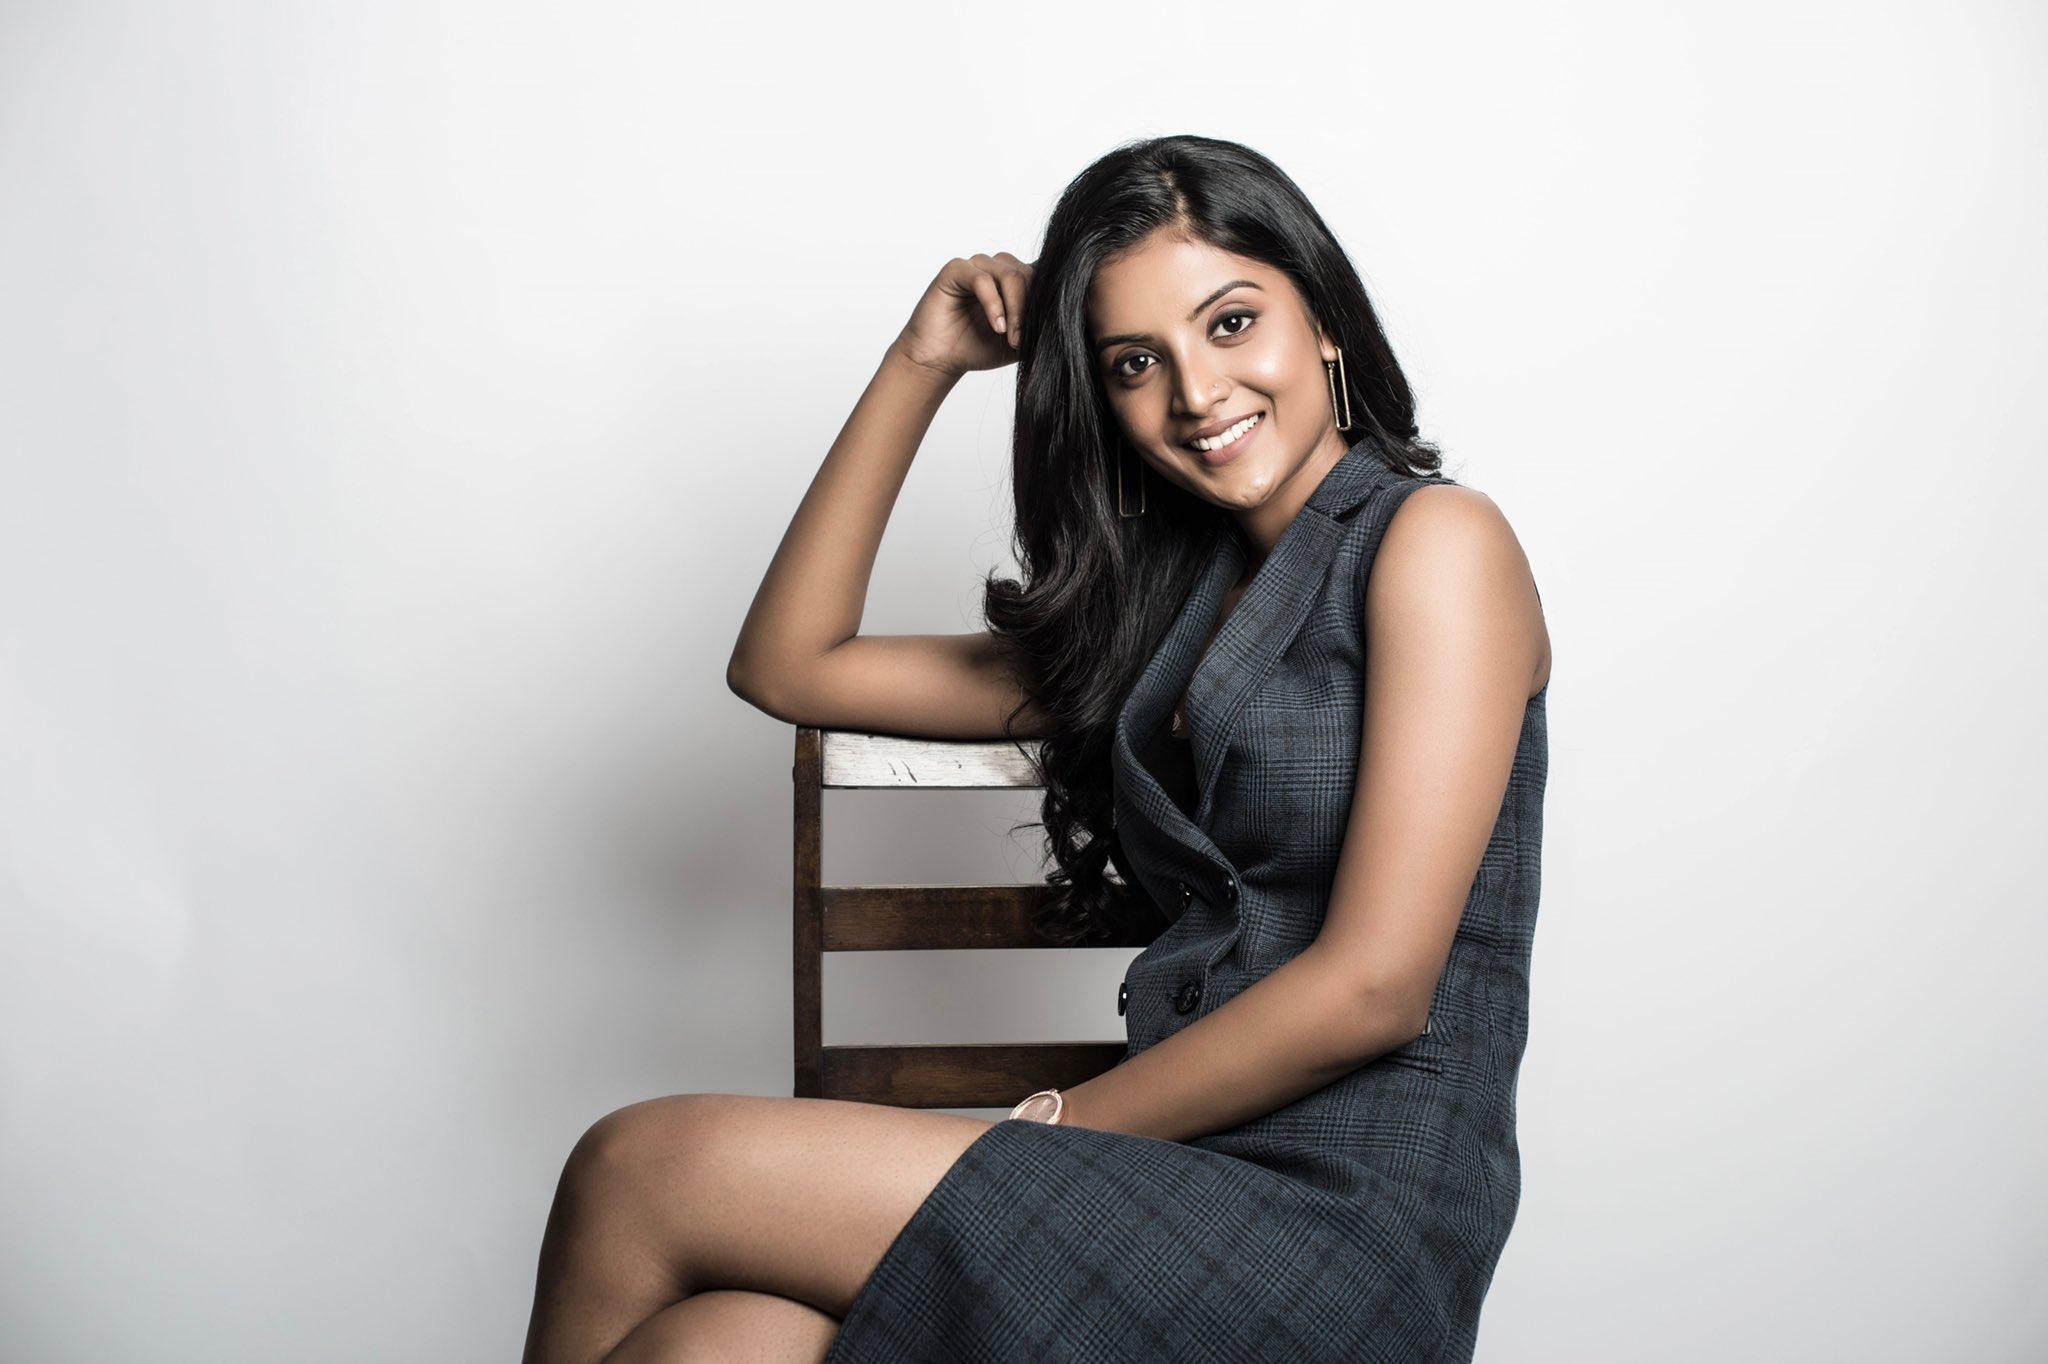 Tamil Actress Nivedhithaa Sathish New Photos (17)